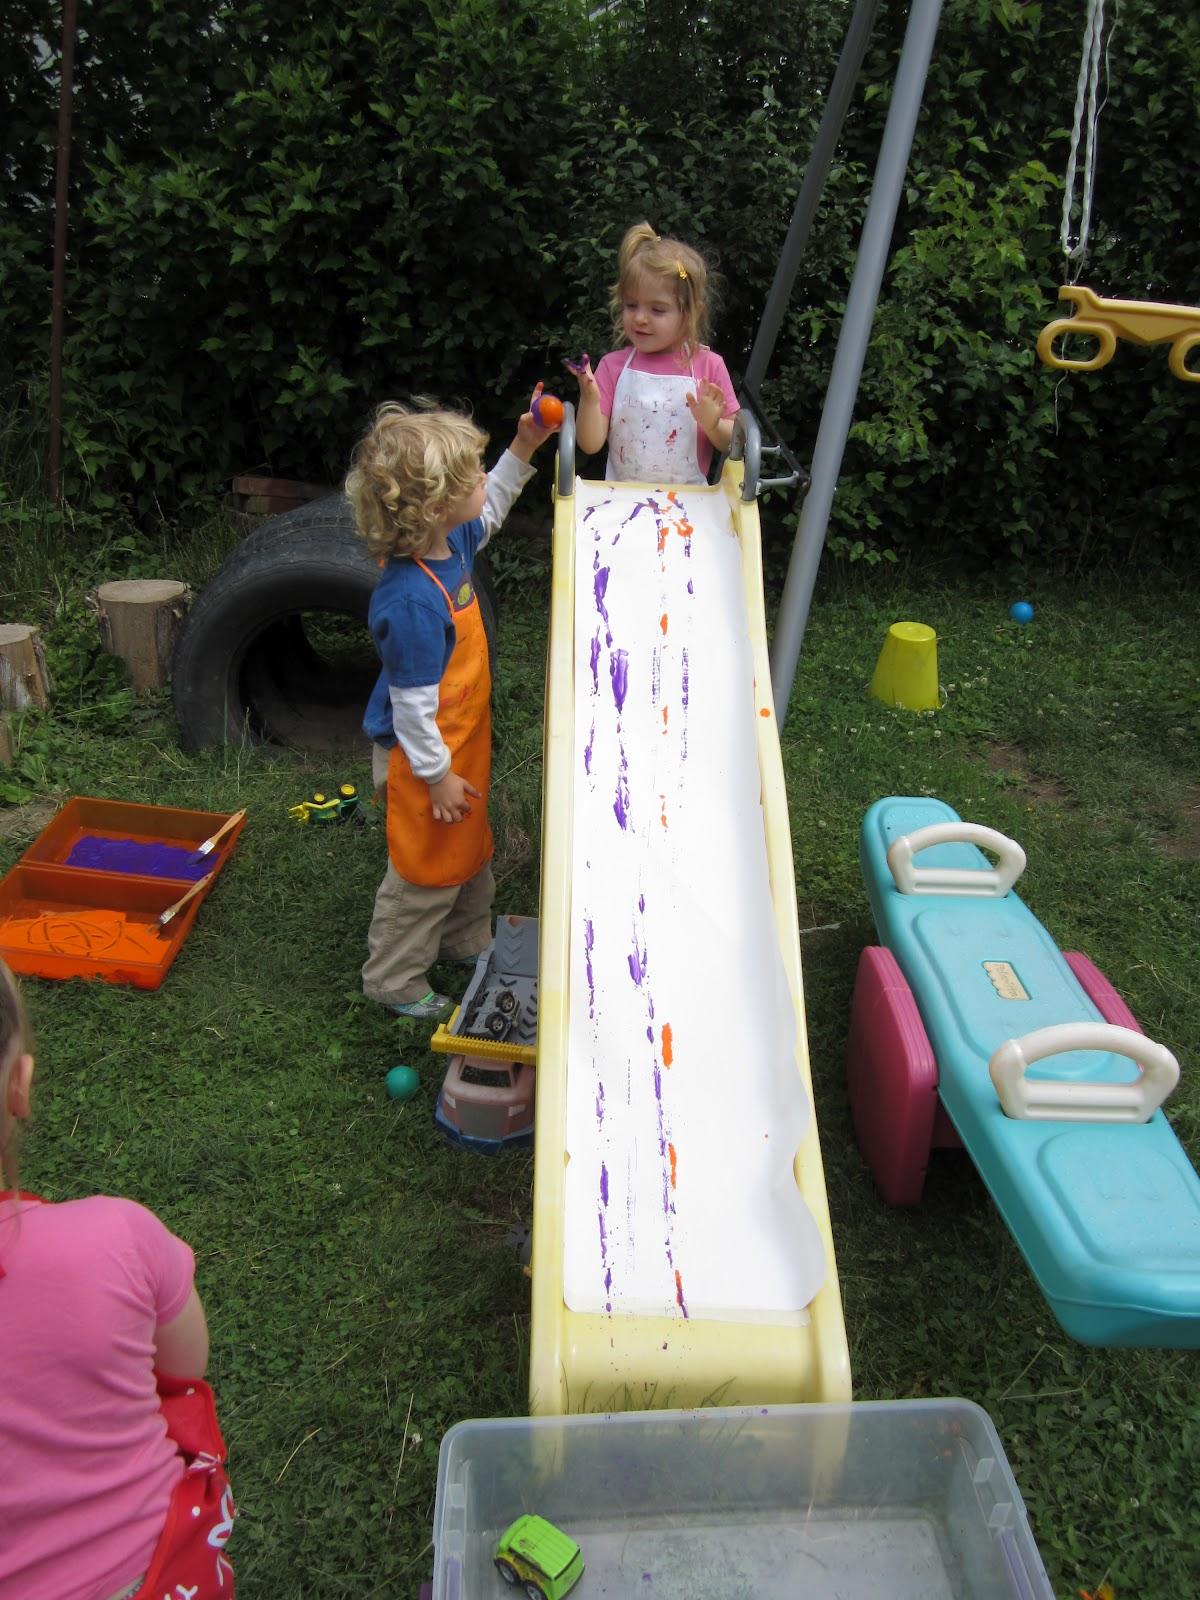 art and soul preschool: Carnival and Camping Fun!